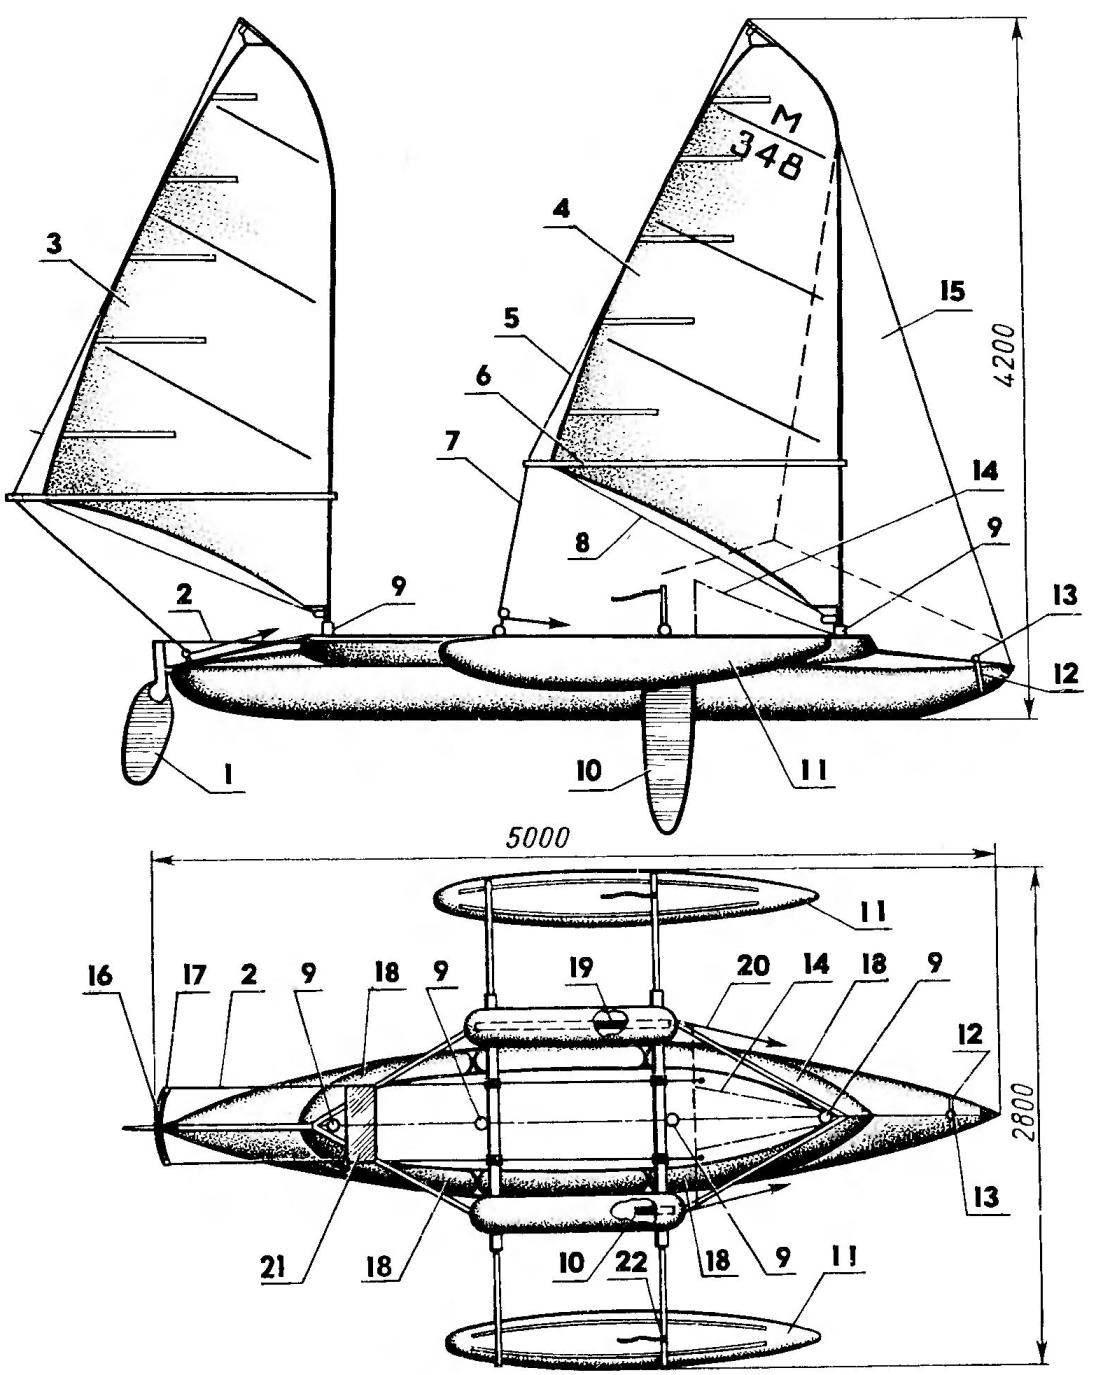 Рис. 1. Шхуна-тримаран на базе байдарки «Таймень-2»